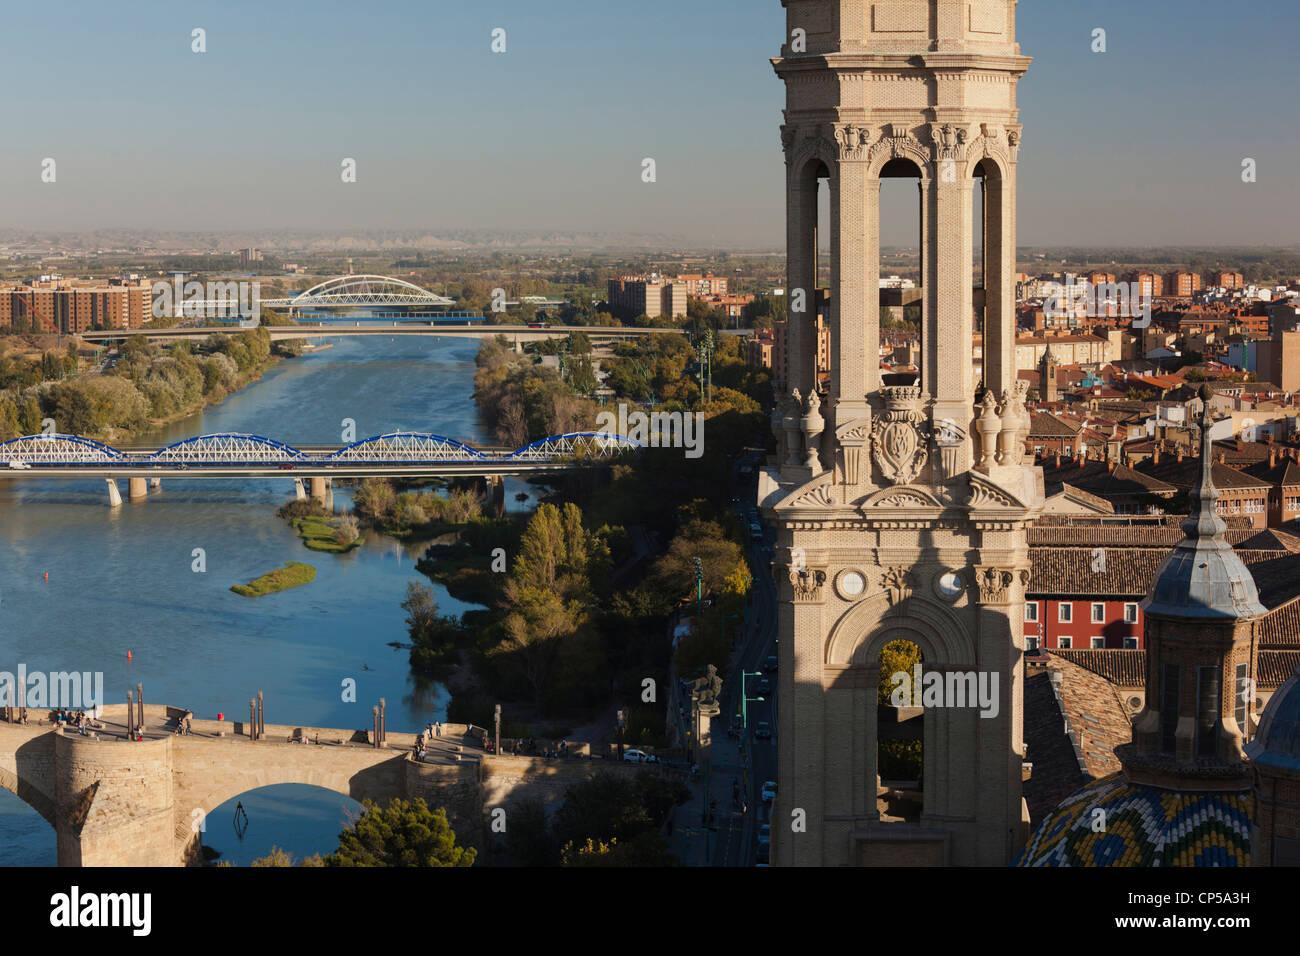 Spain, Zaragoza Province, Zaragoza, Basilica de Nuestra Senora del Pilar, elevated view from the Torre Pilar tower - Stock Image